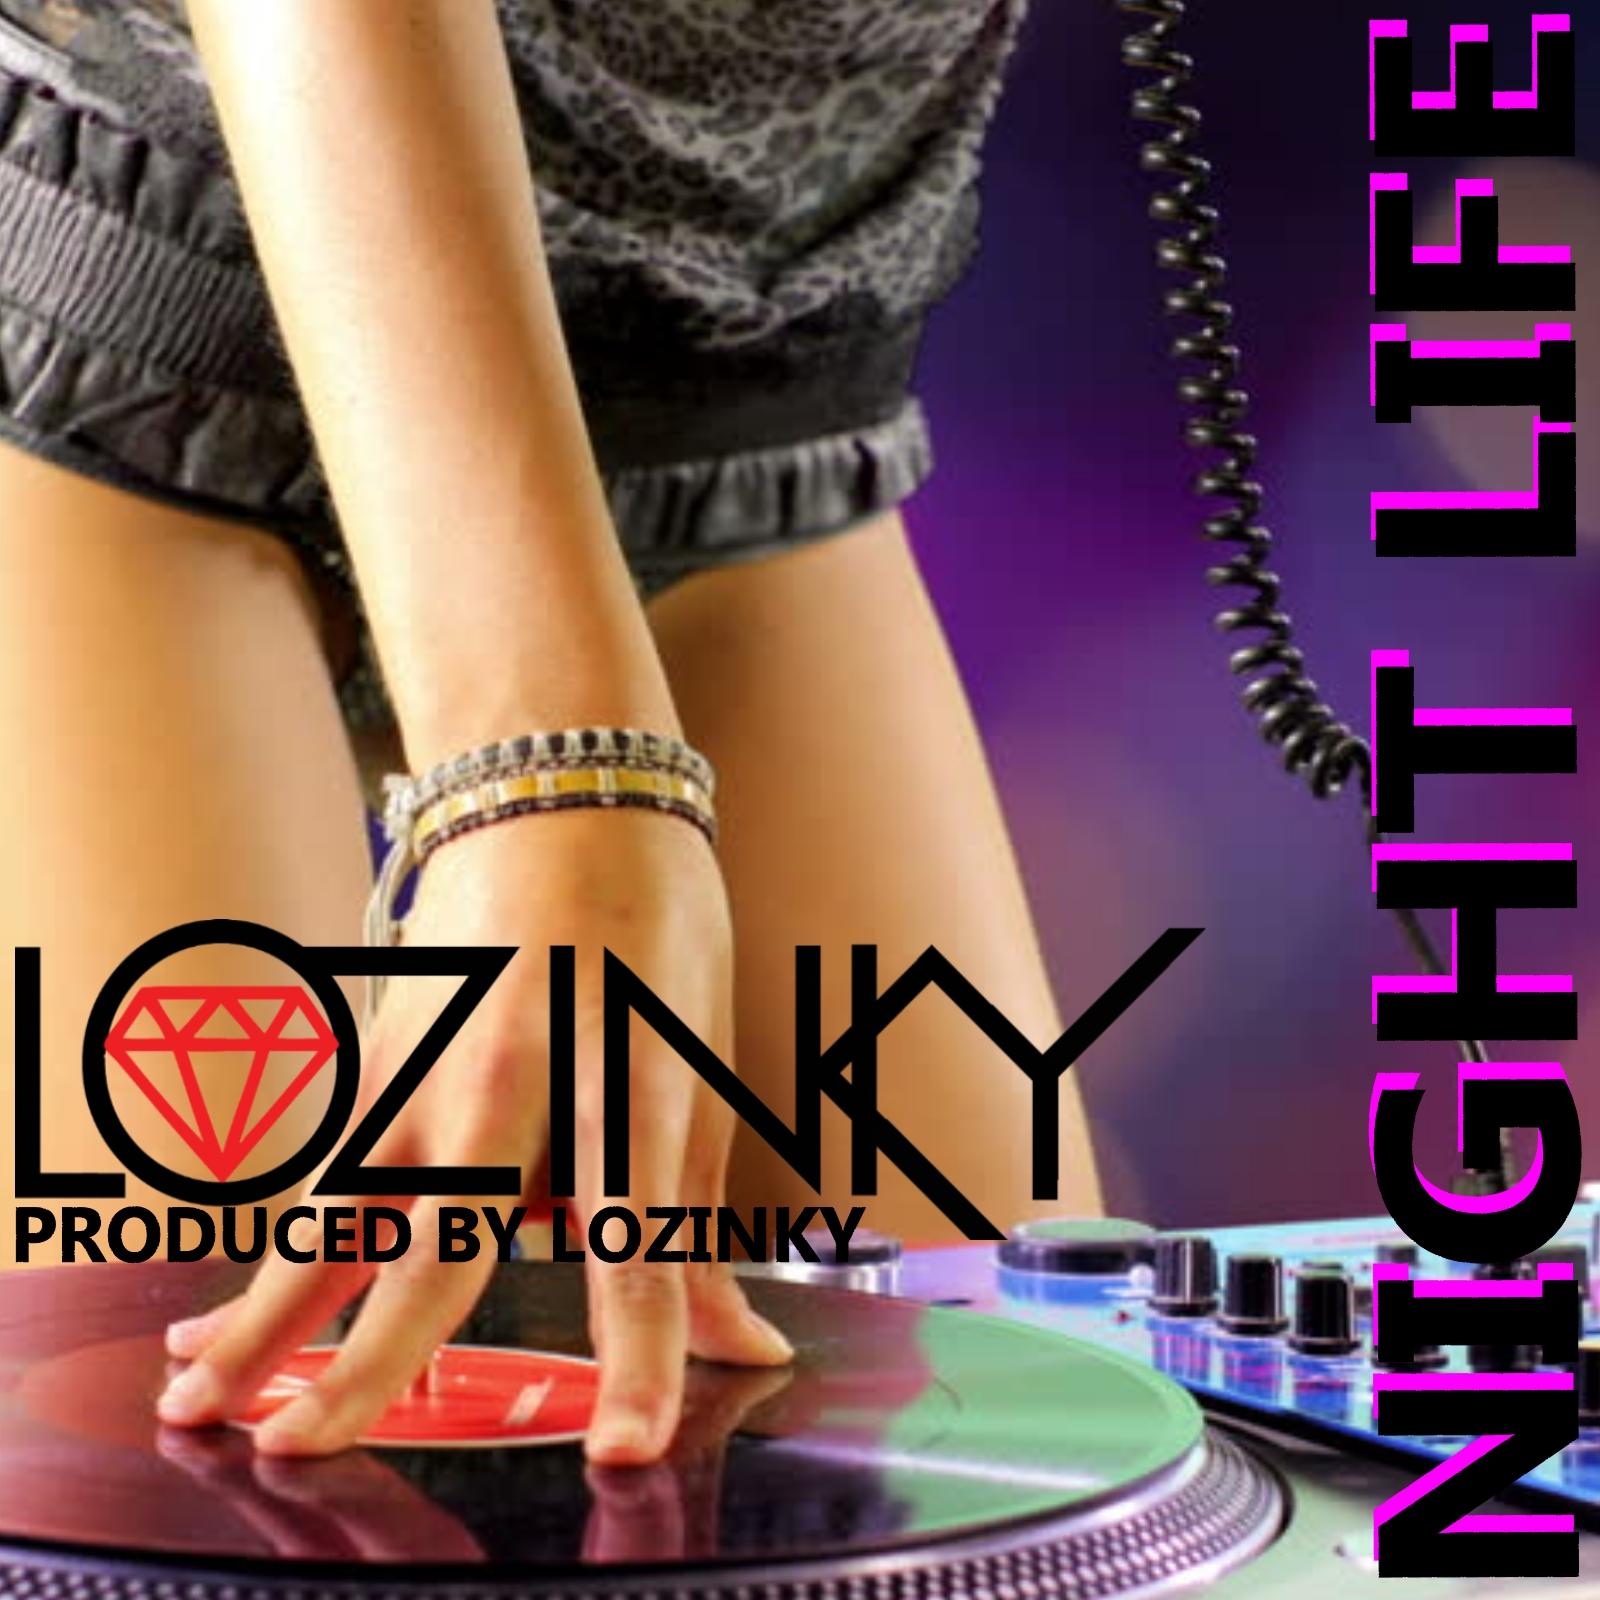 Lozinky - Night Life